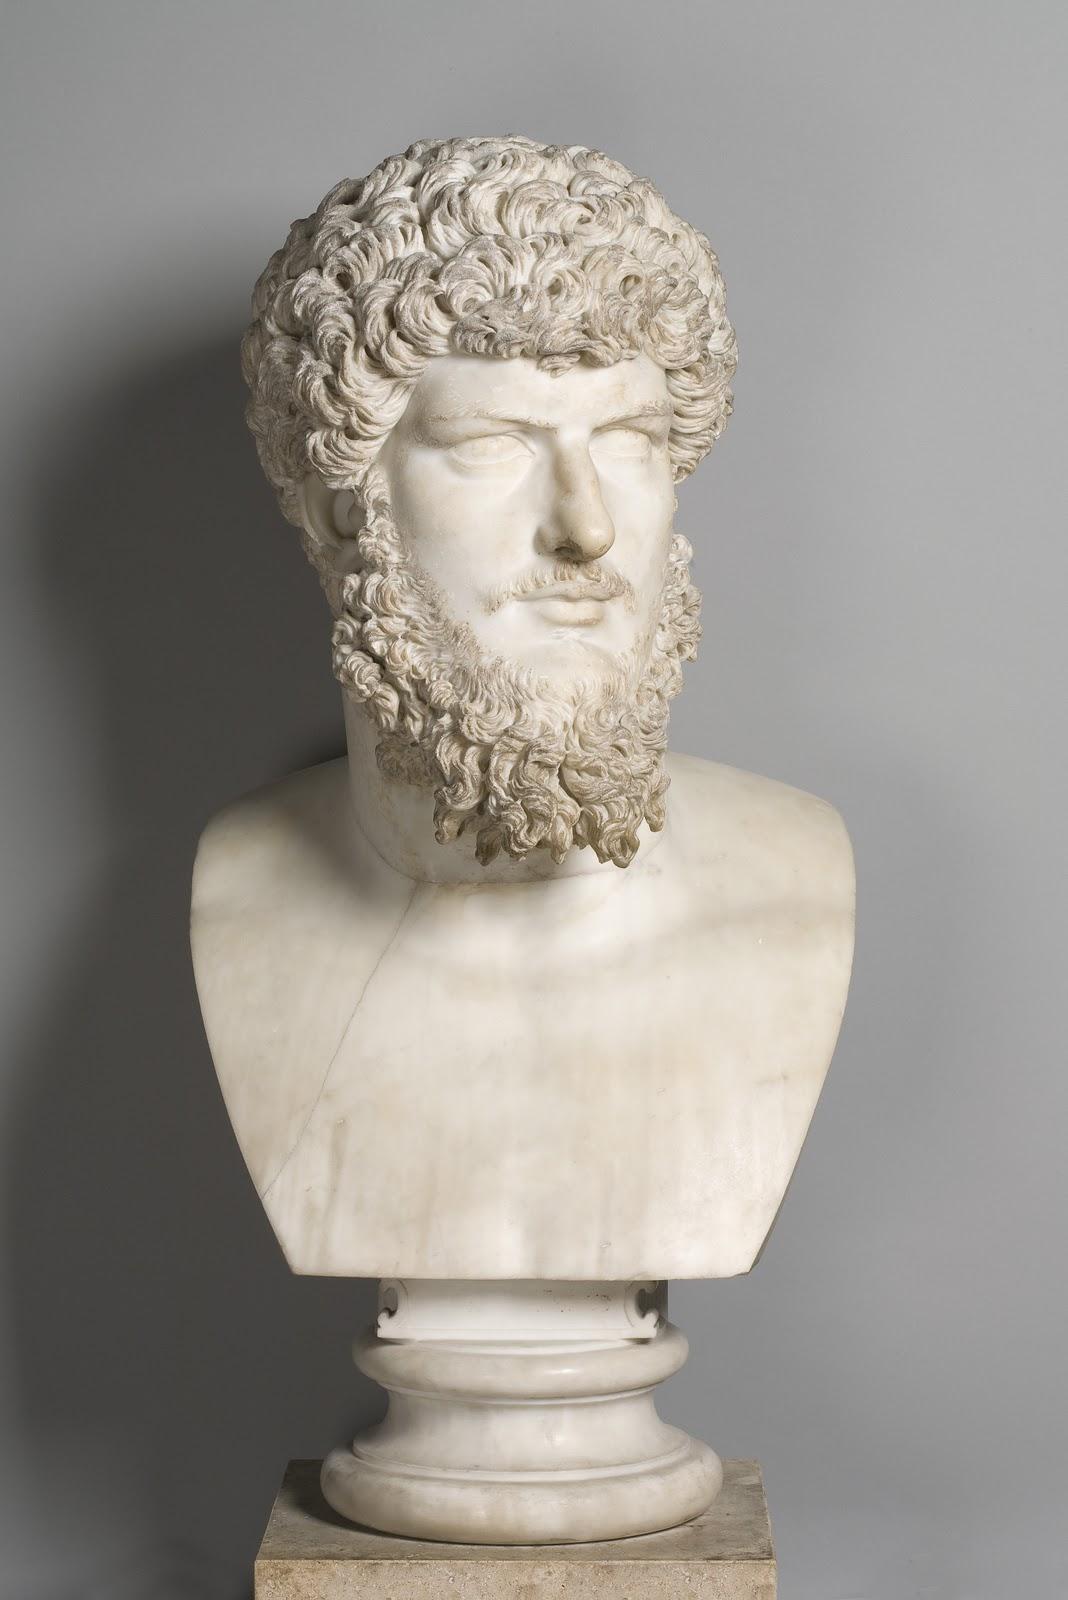 Portrait of Lucius Verus. Head: ca. 180 AD, modern bust: Carlo Albacini. Louvre Museum, Paris. © Musée du Louvre, Daniel Lebée and Carine Déambrosis